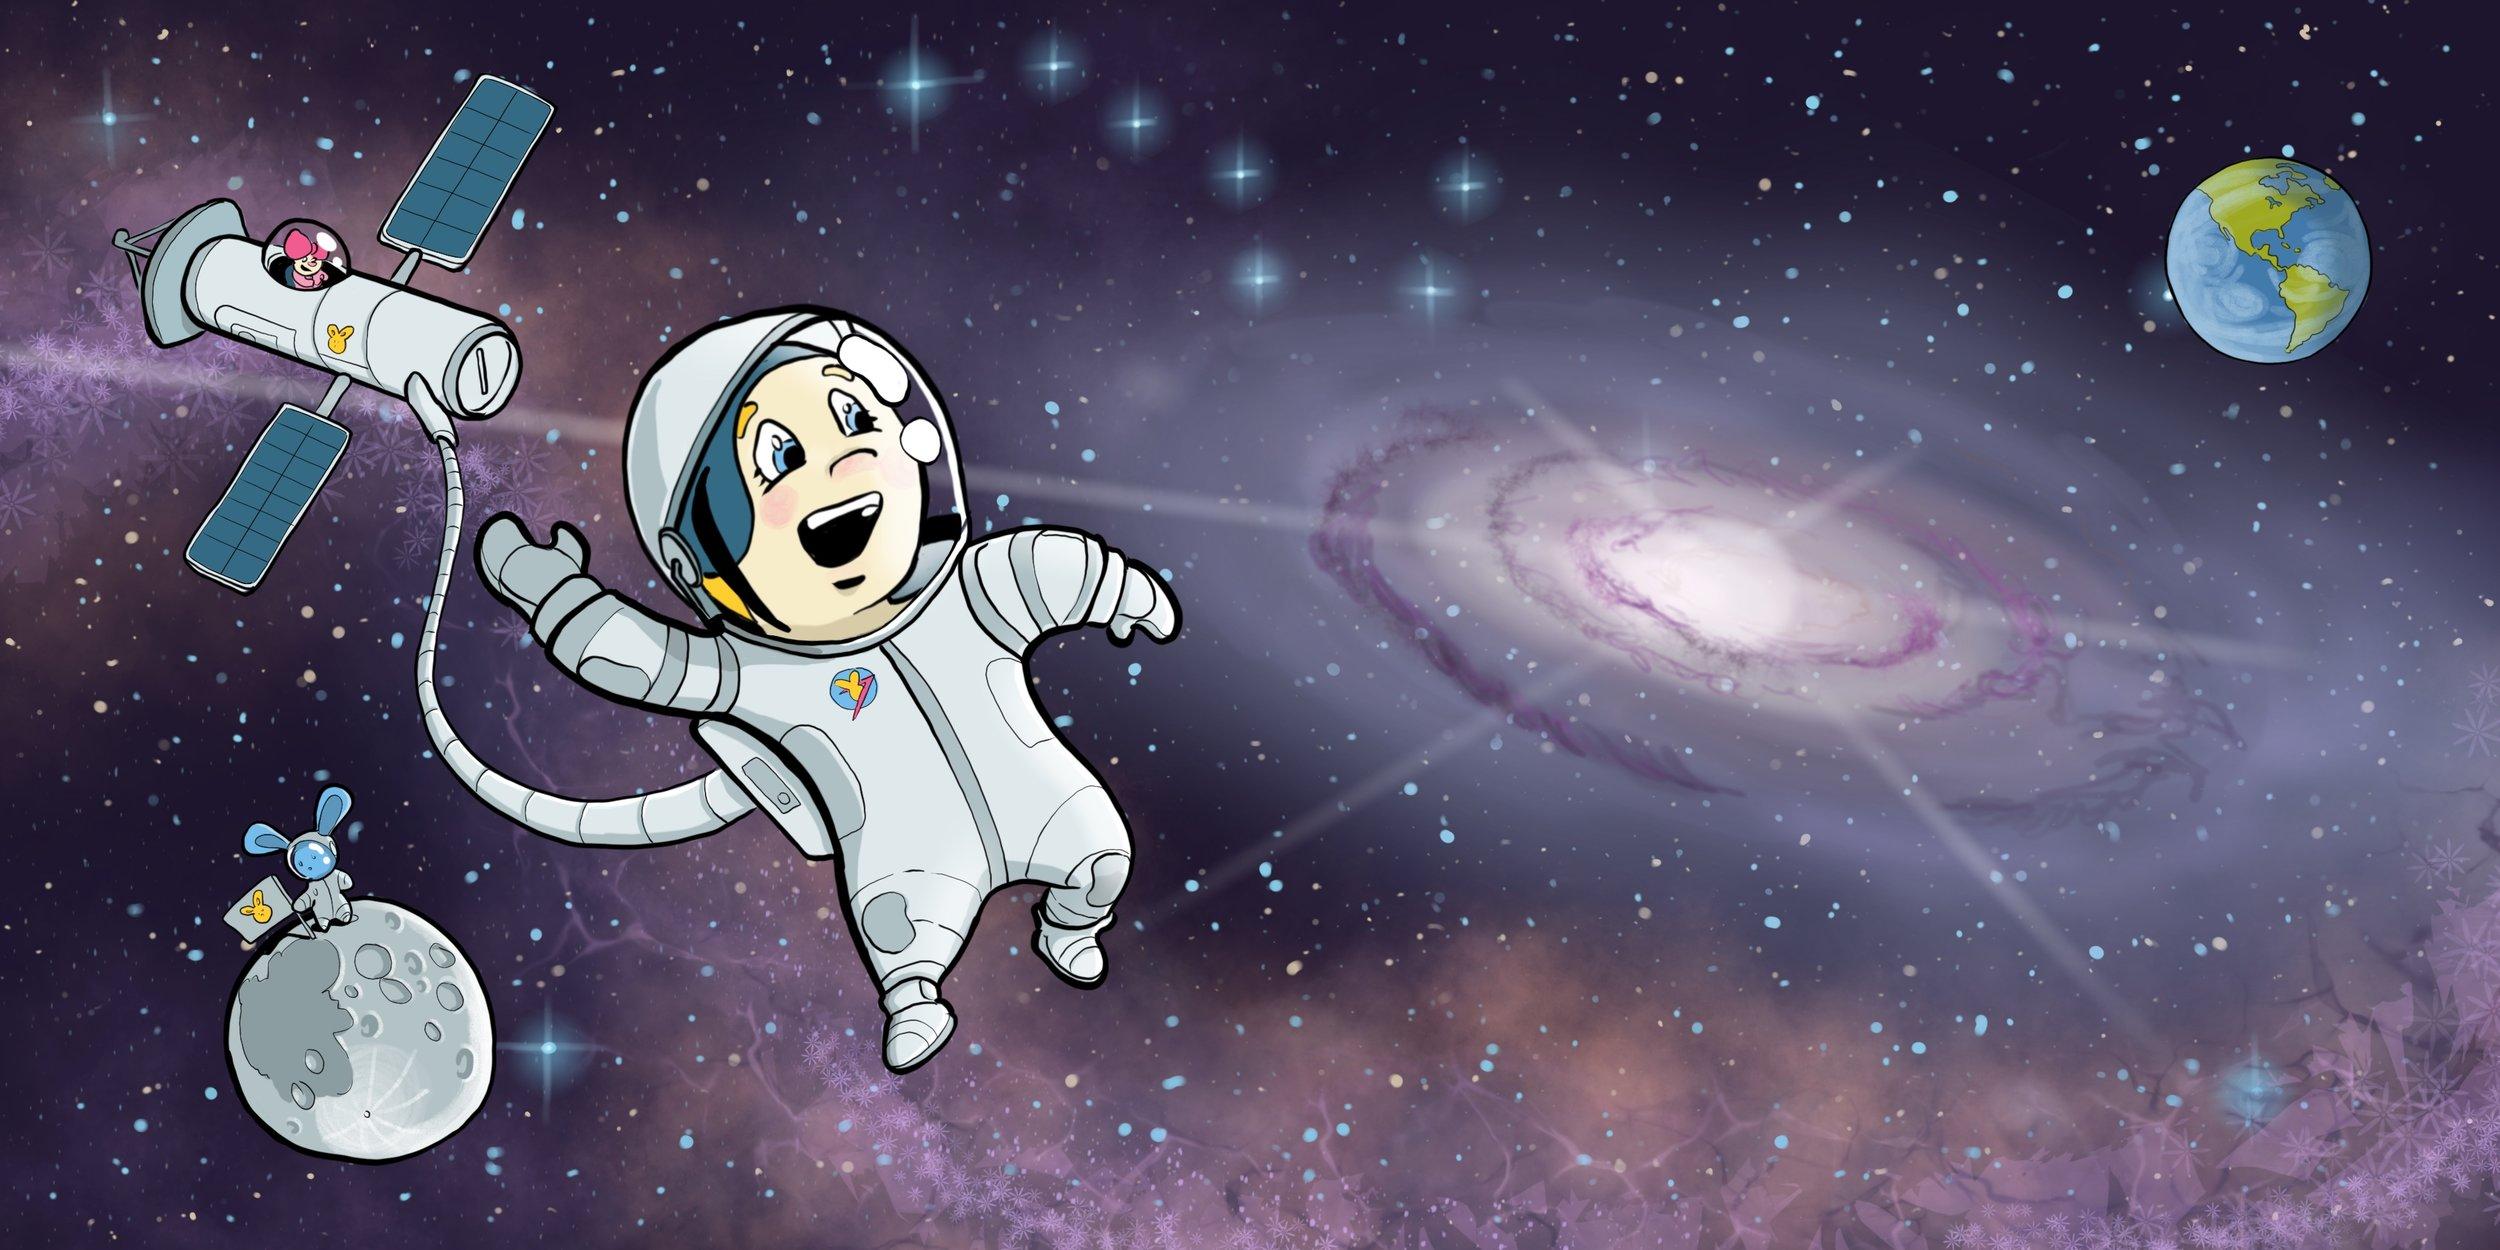 12._Astronaut.jpg